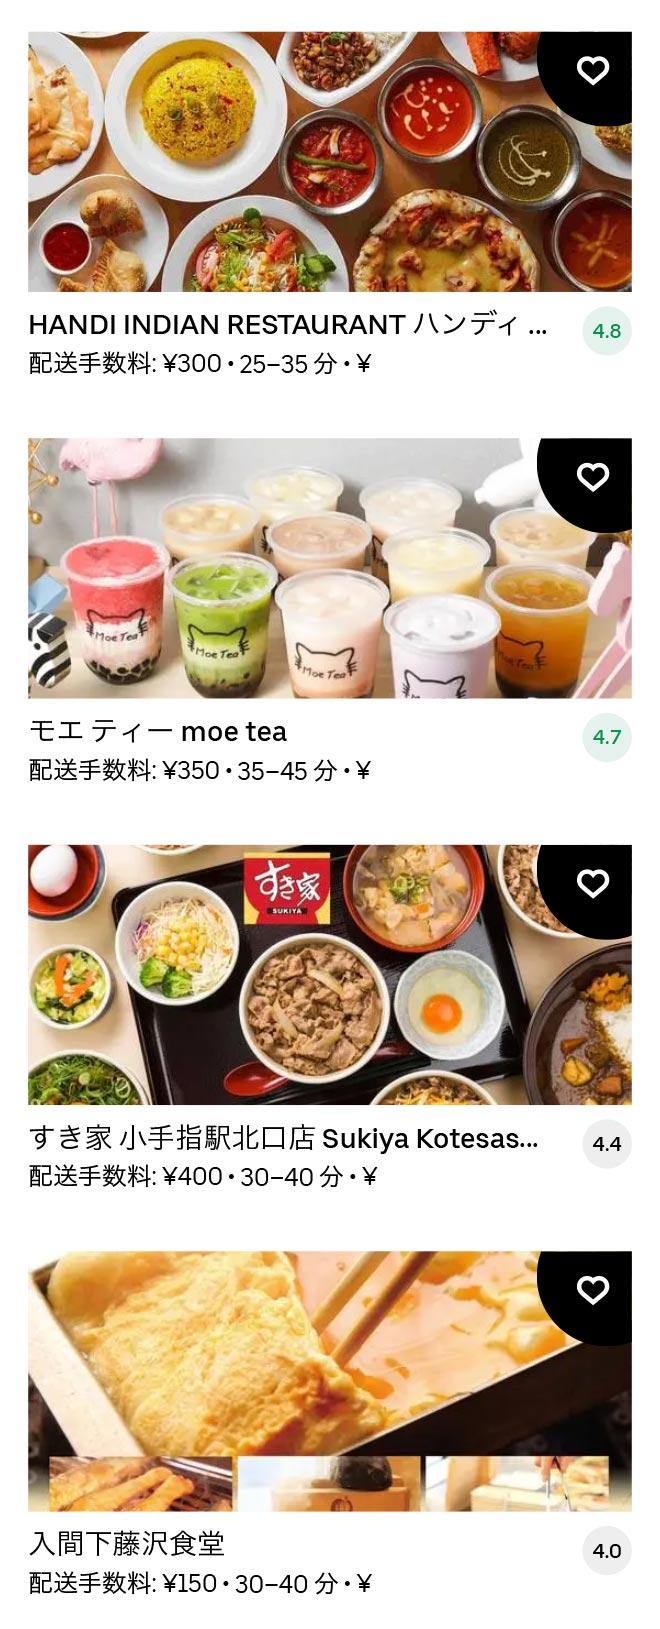 Musashi fujisawa menu 2101 05